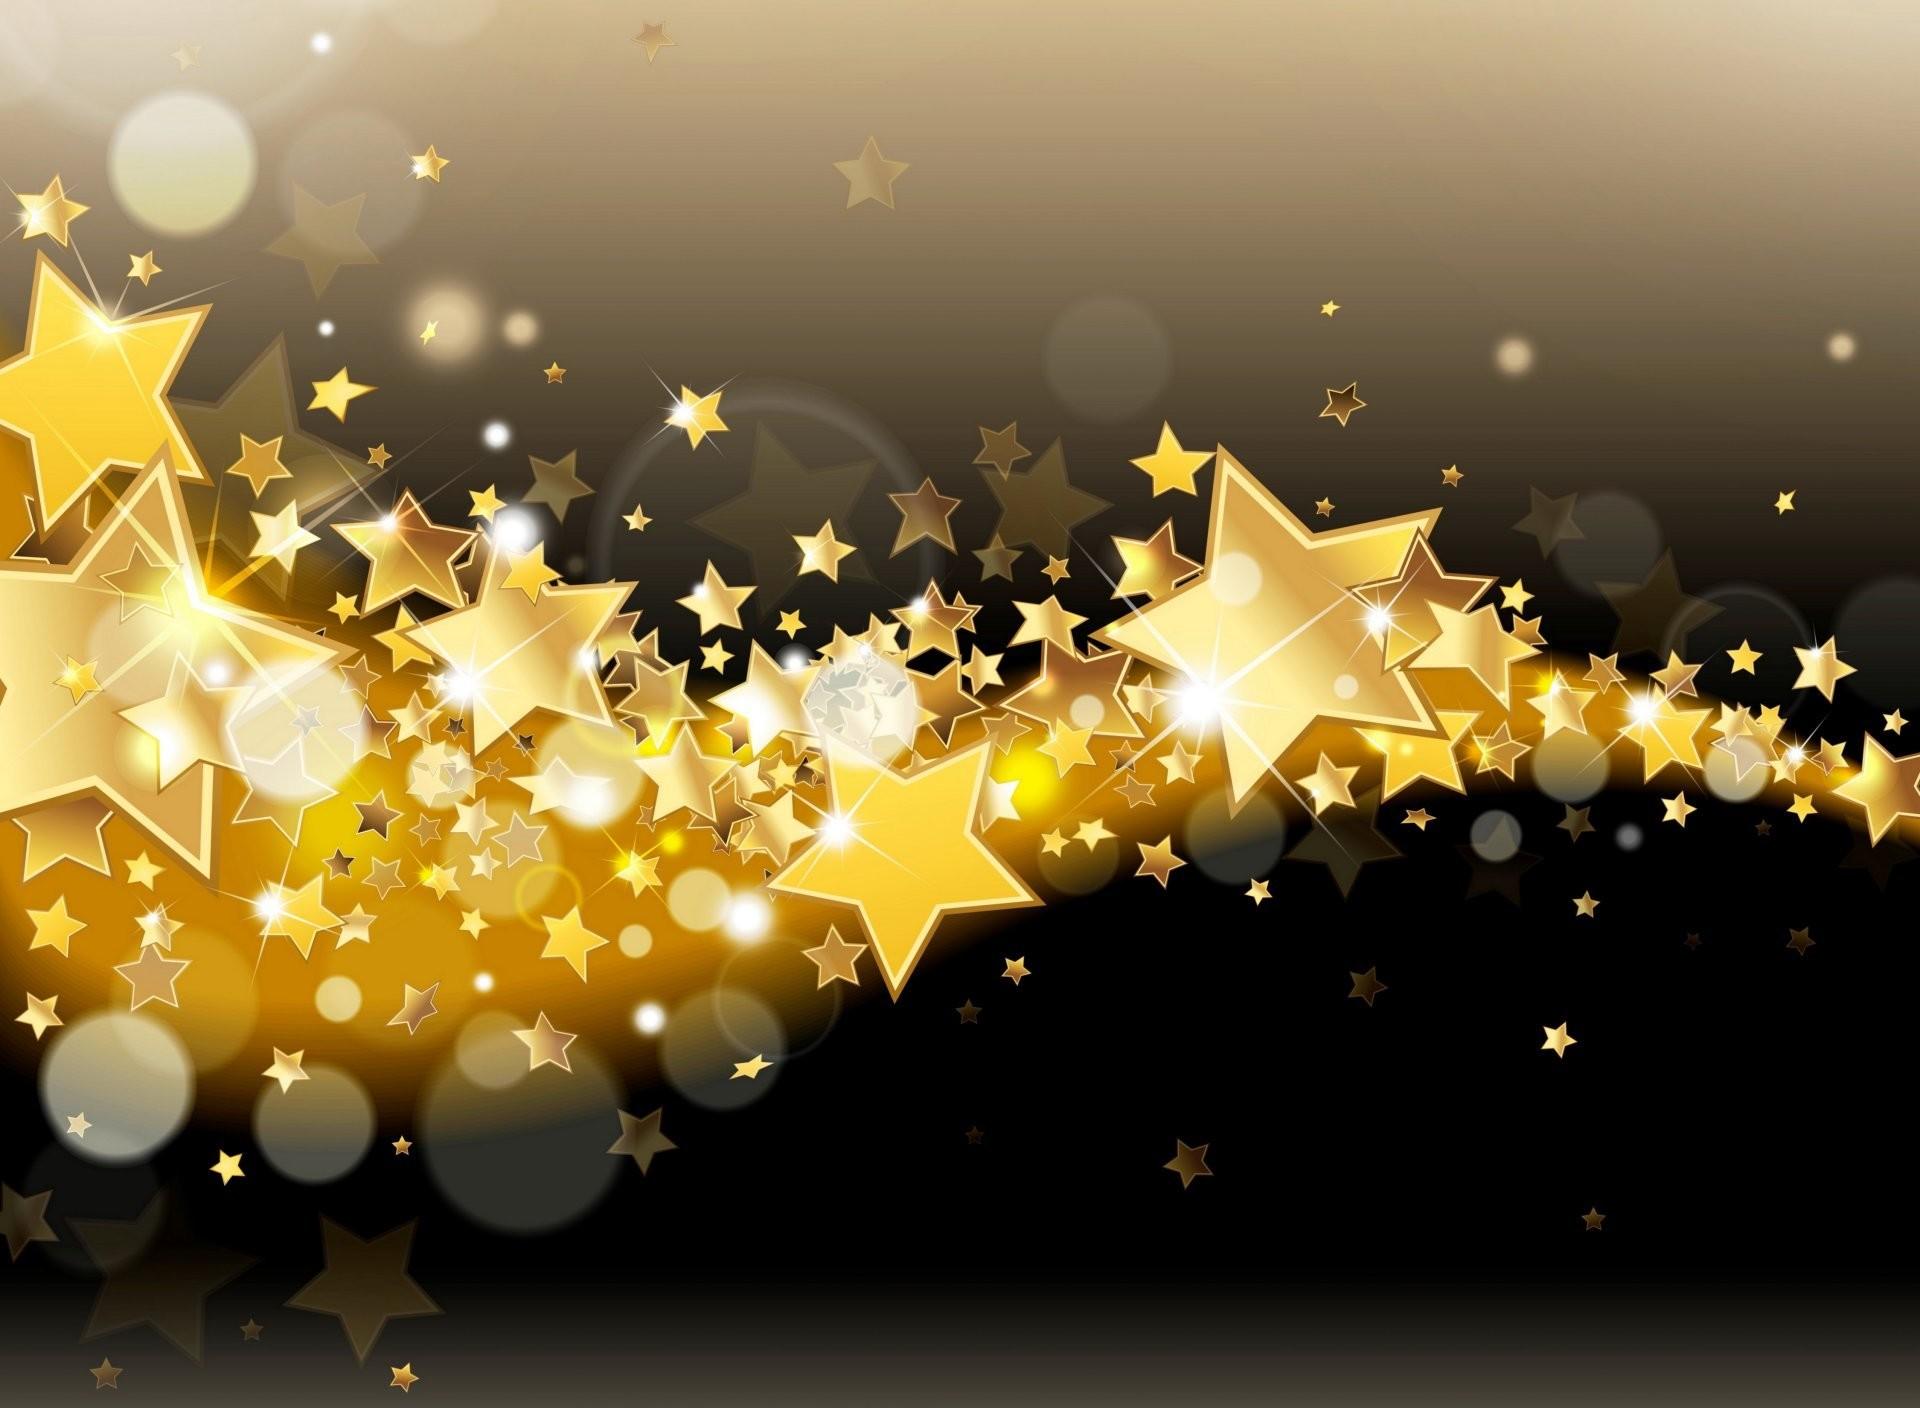 golden stars sparkle glitter glow background background star gold shine  lights